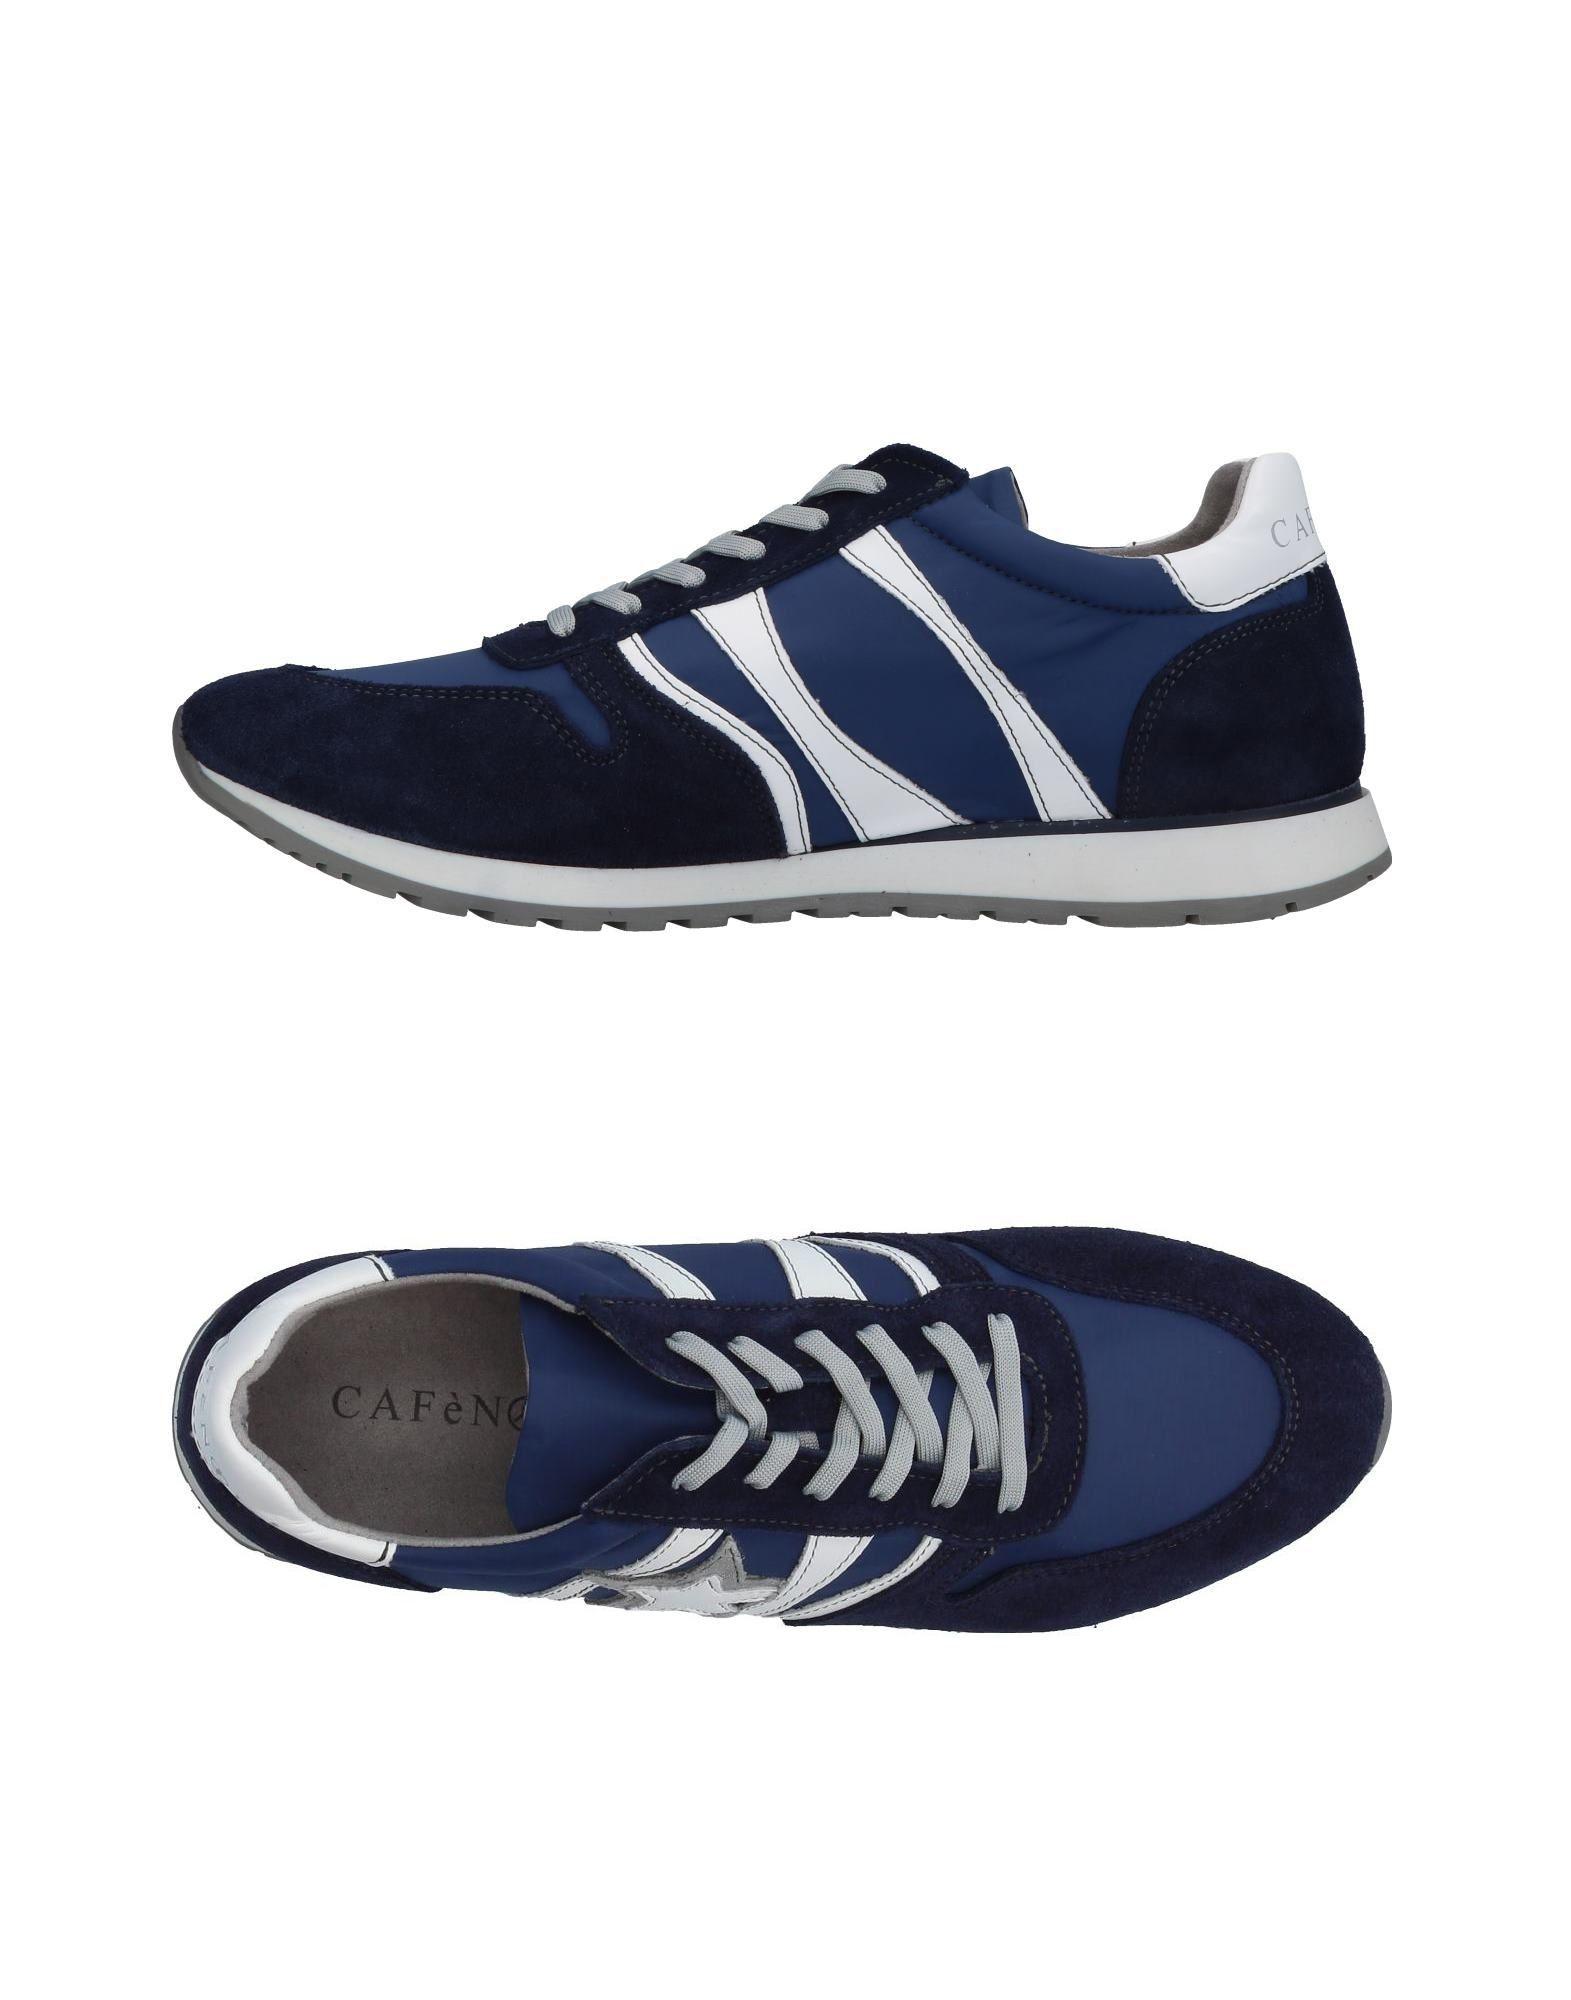 Cafènoir Sneakers Sneakers Sneakers Herren  11381276LN Heiße Schuhe b69df6